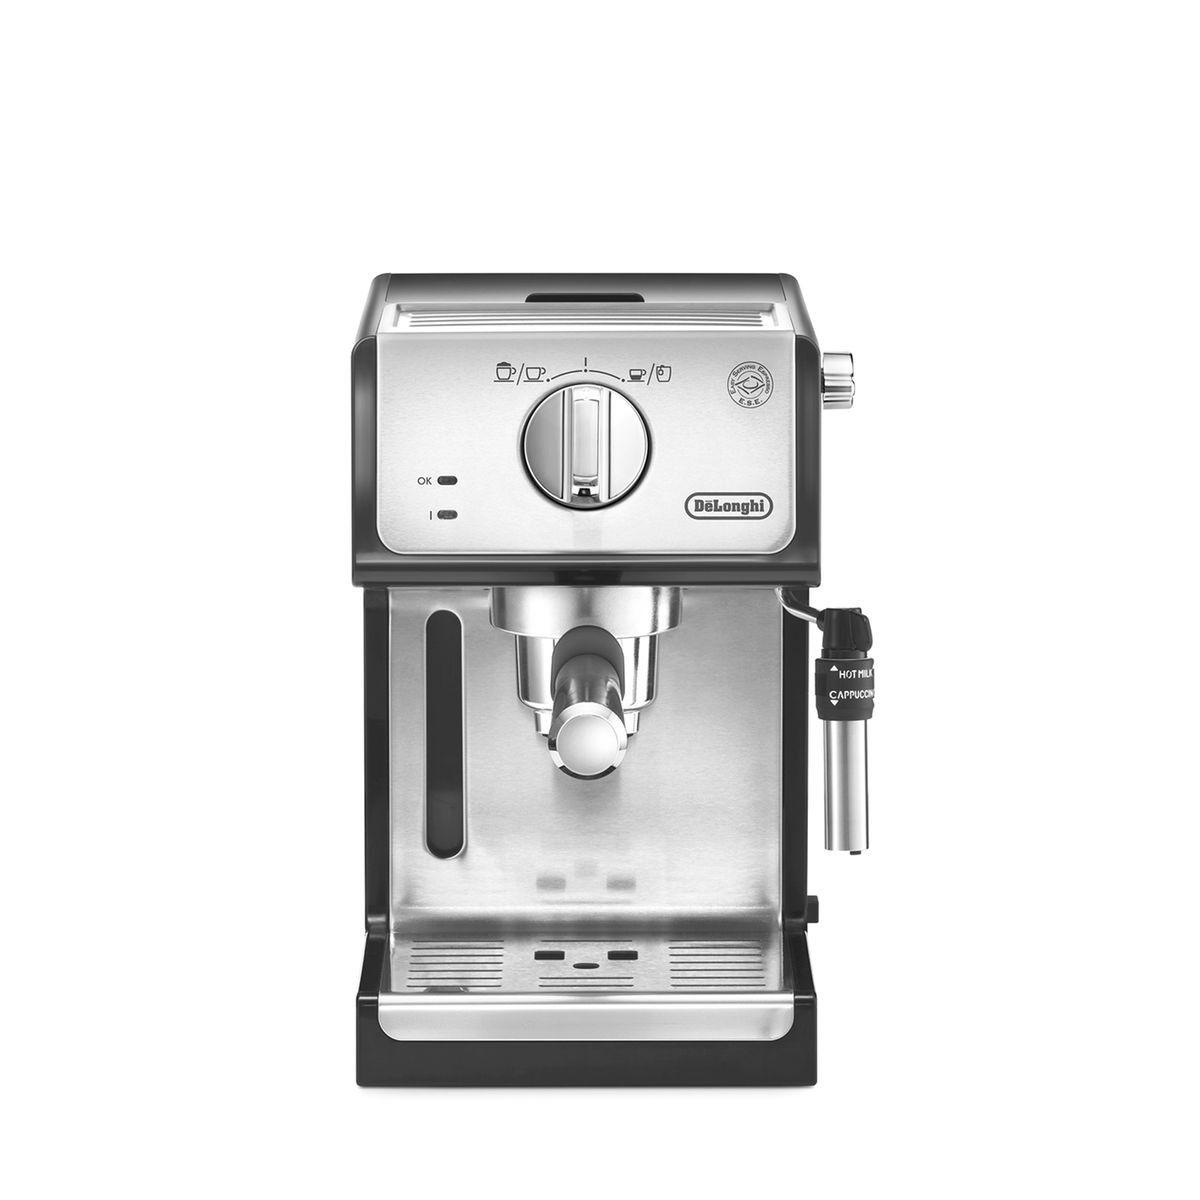 Machine Espresso Ecp 35 31 Machine A Cafe Expresso Cafetiere